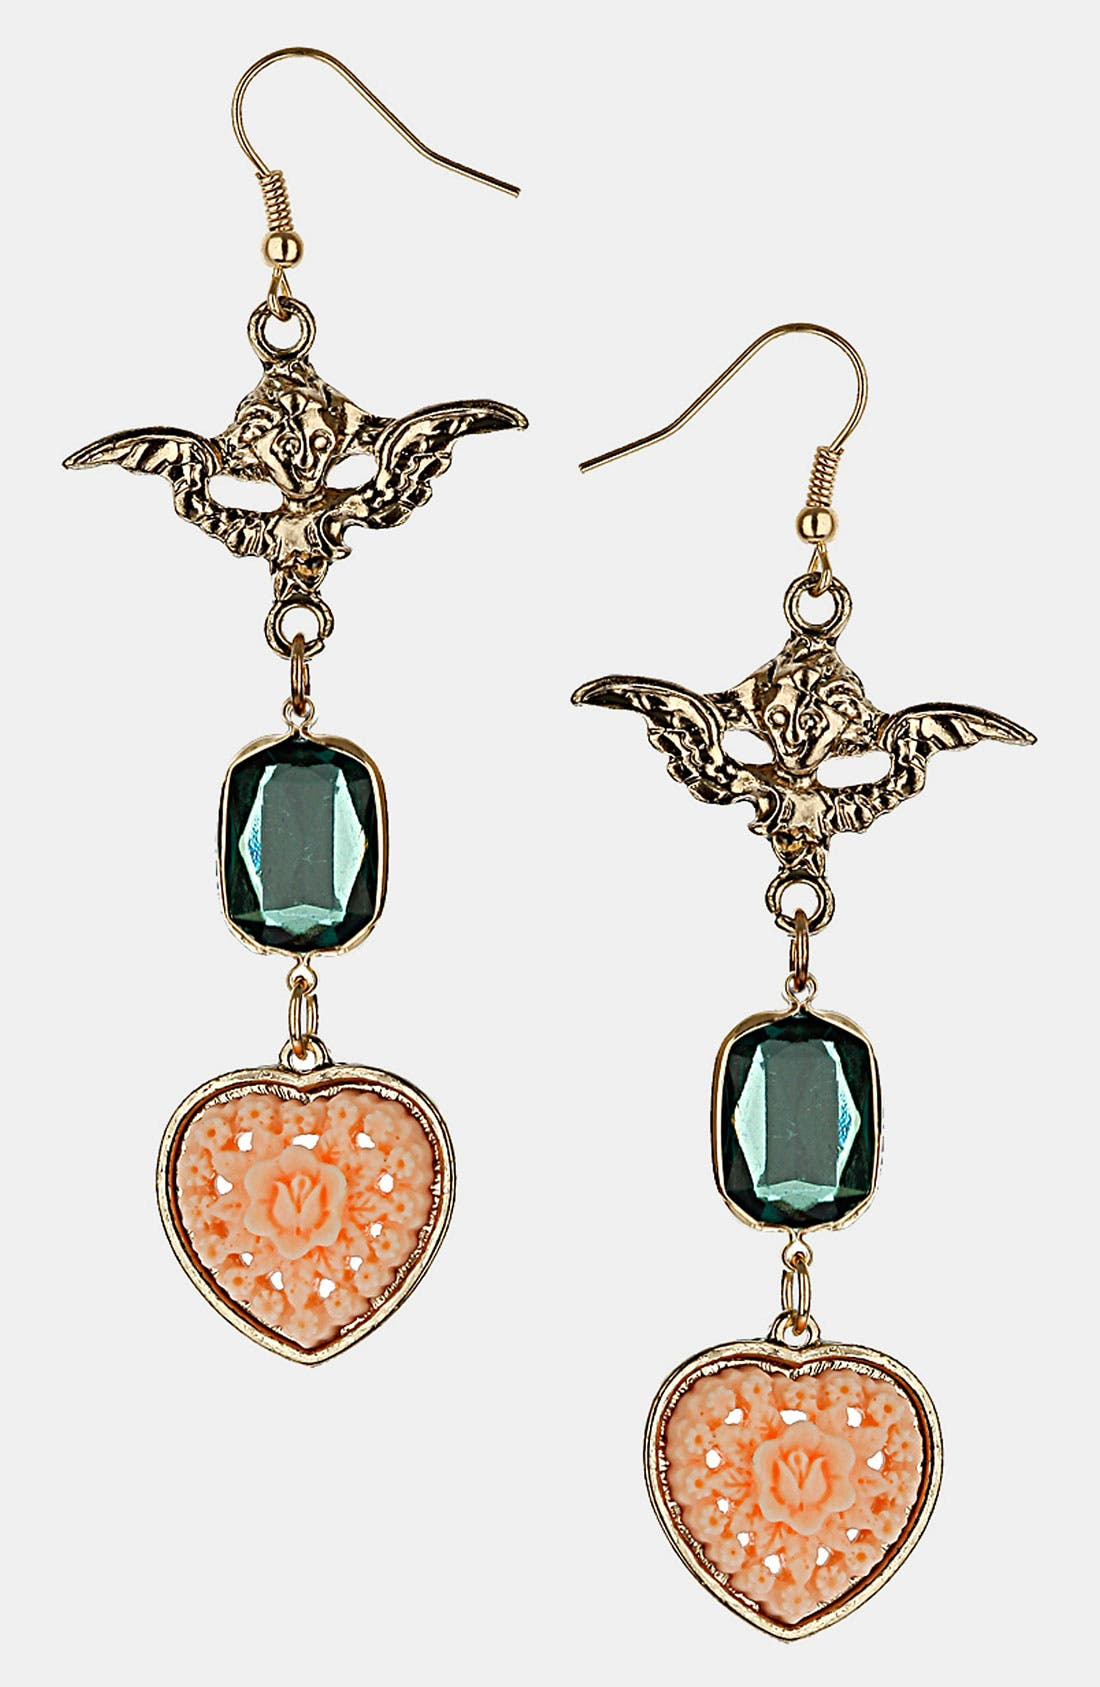 Main Image - Topshop 'Cherub' Heart Earrings